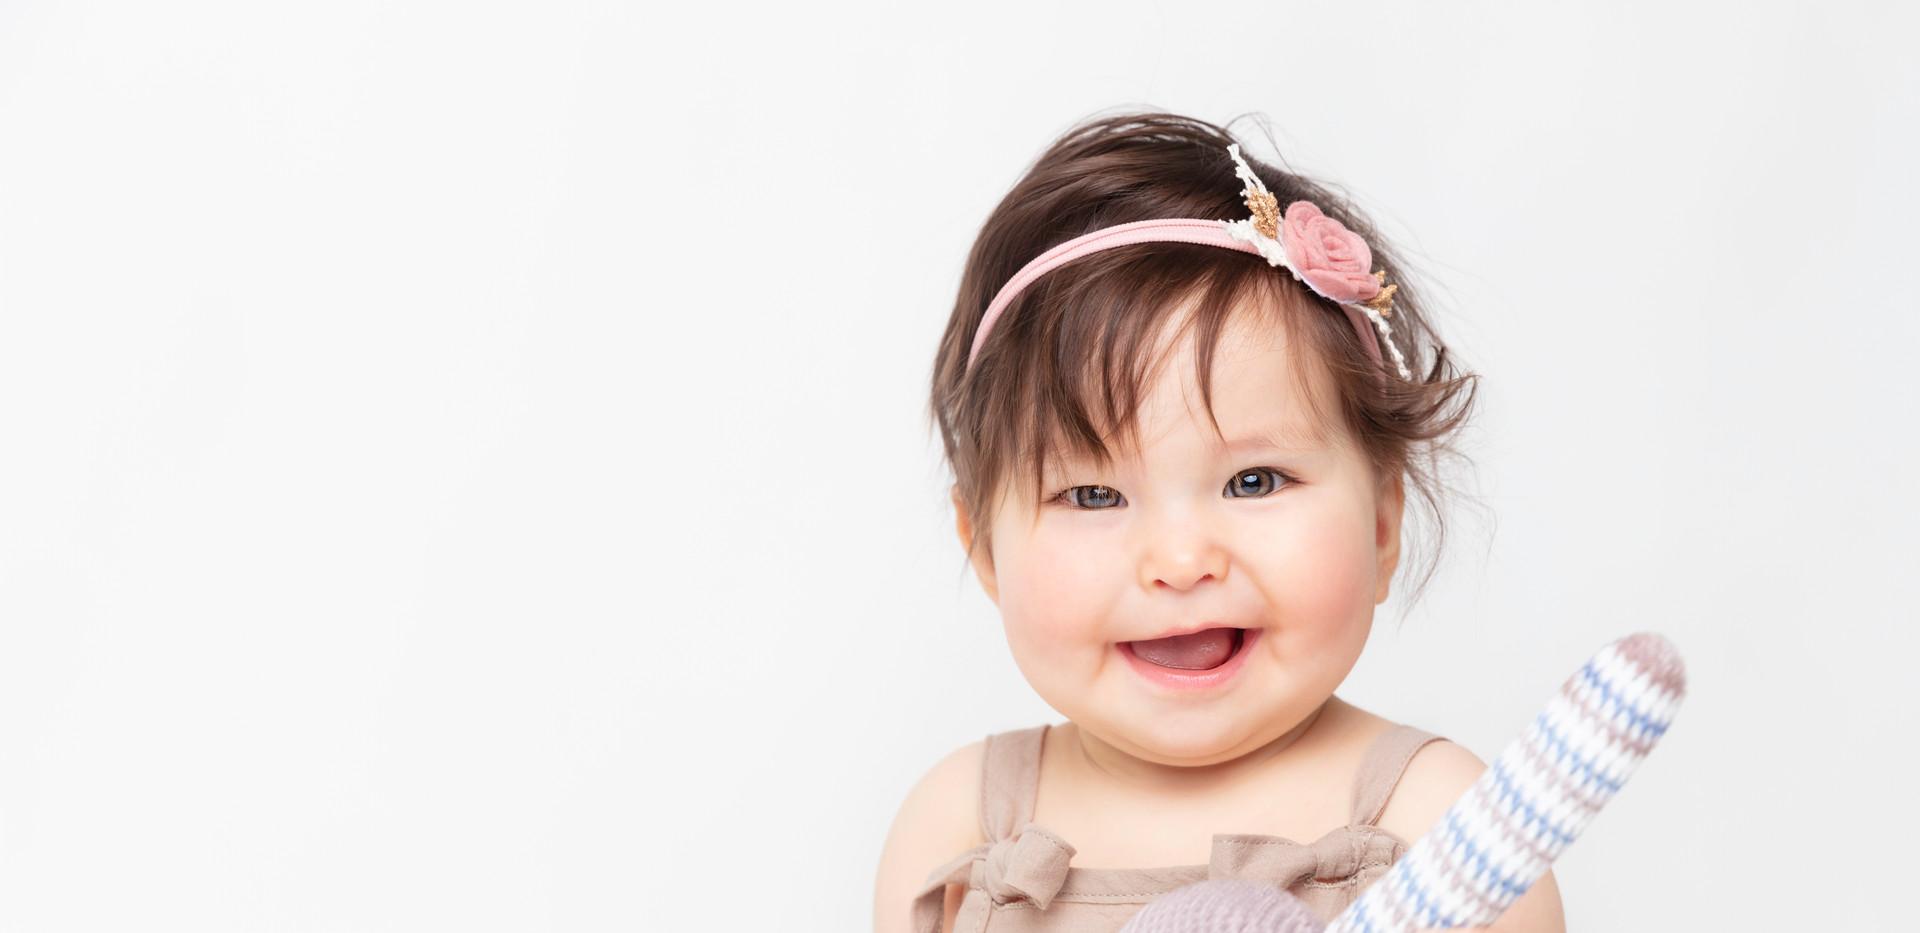 Strahlendes Baby [_V6A7777-Edit.jpg]